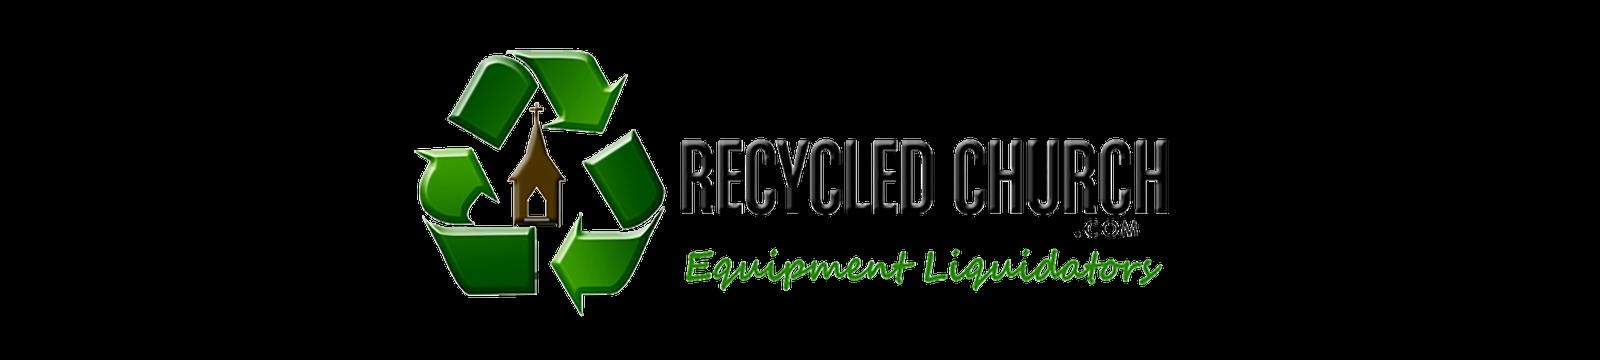 RecycledChurch